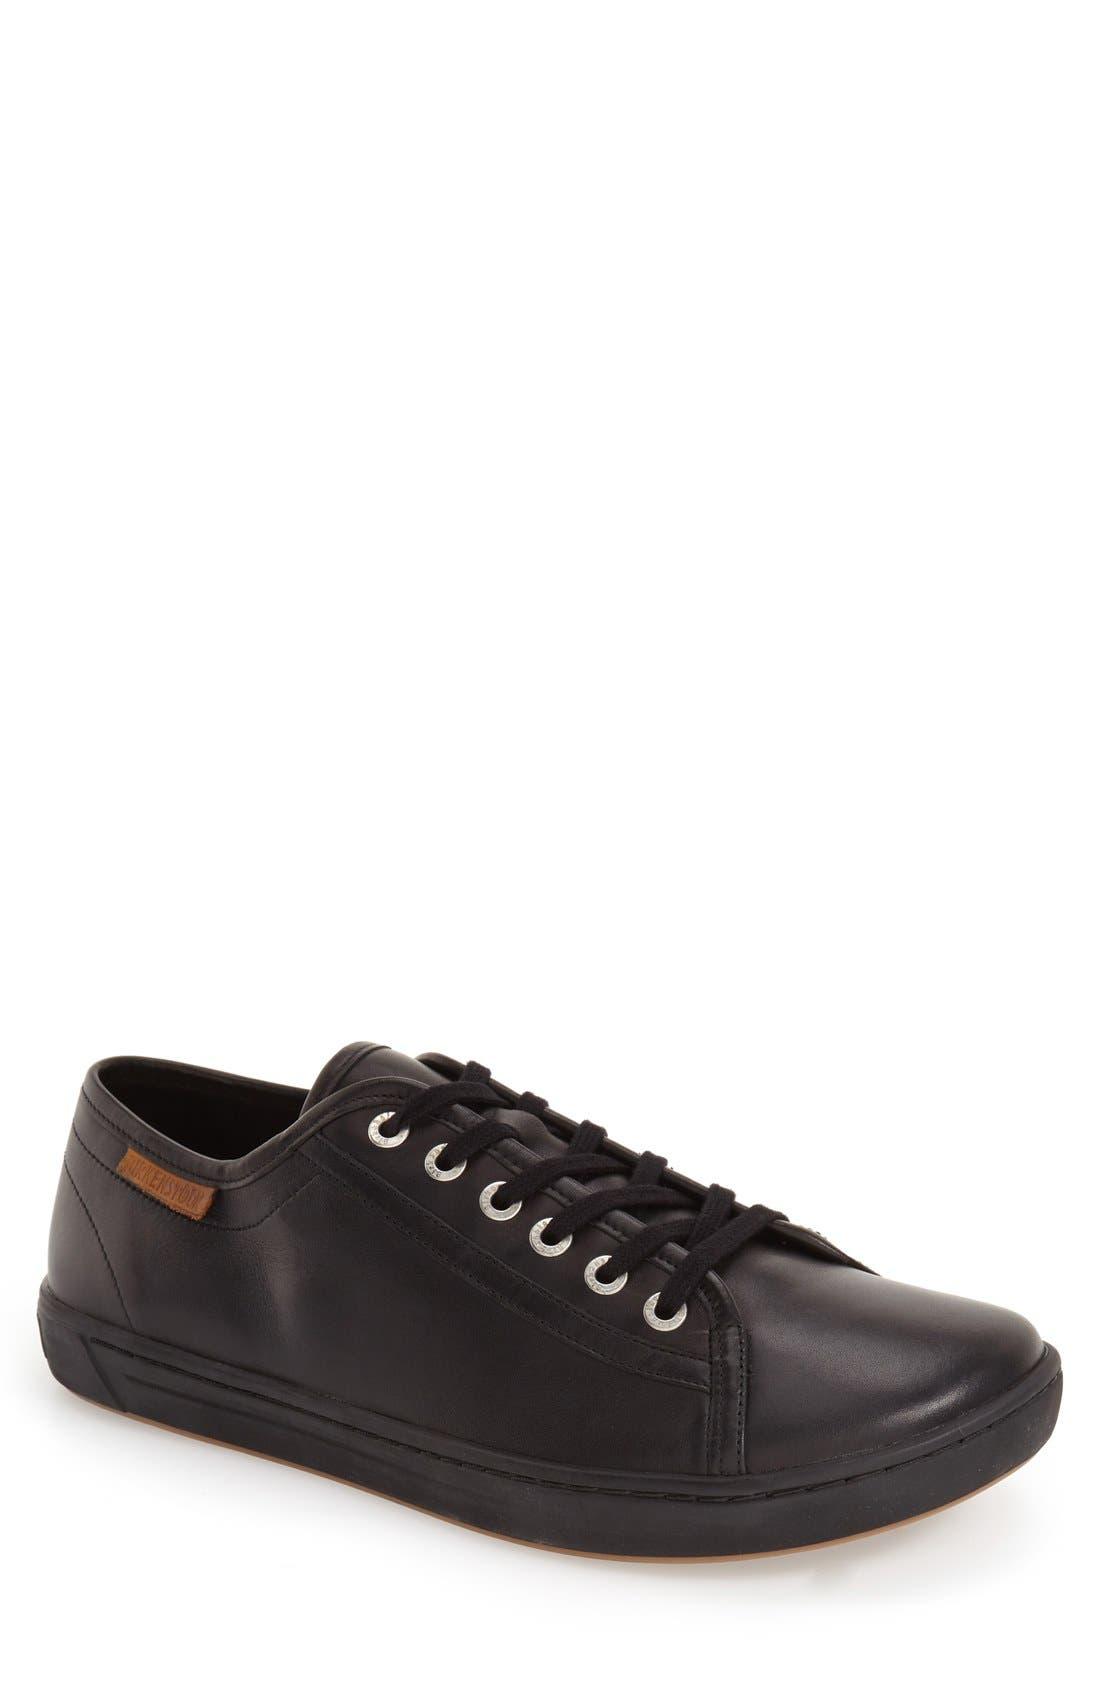 'Arran' Sneaker,                             Main thumbnail 1, color,                             Black